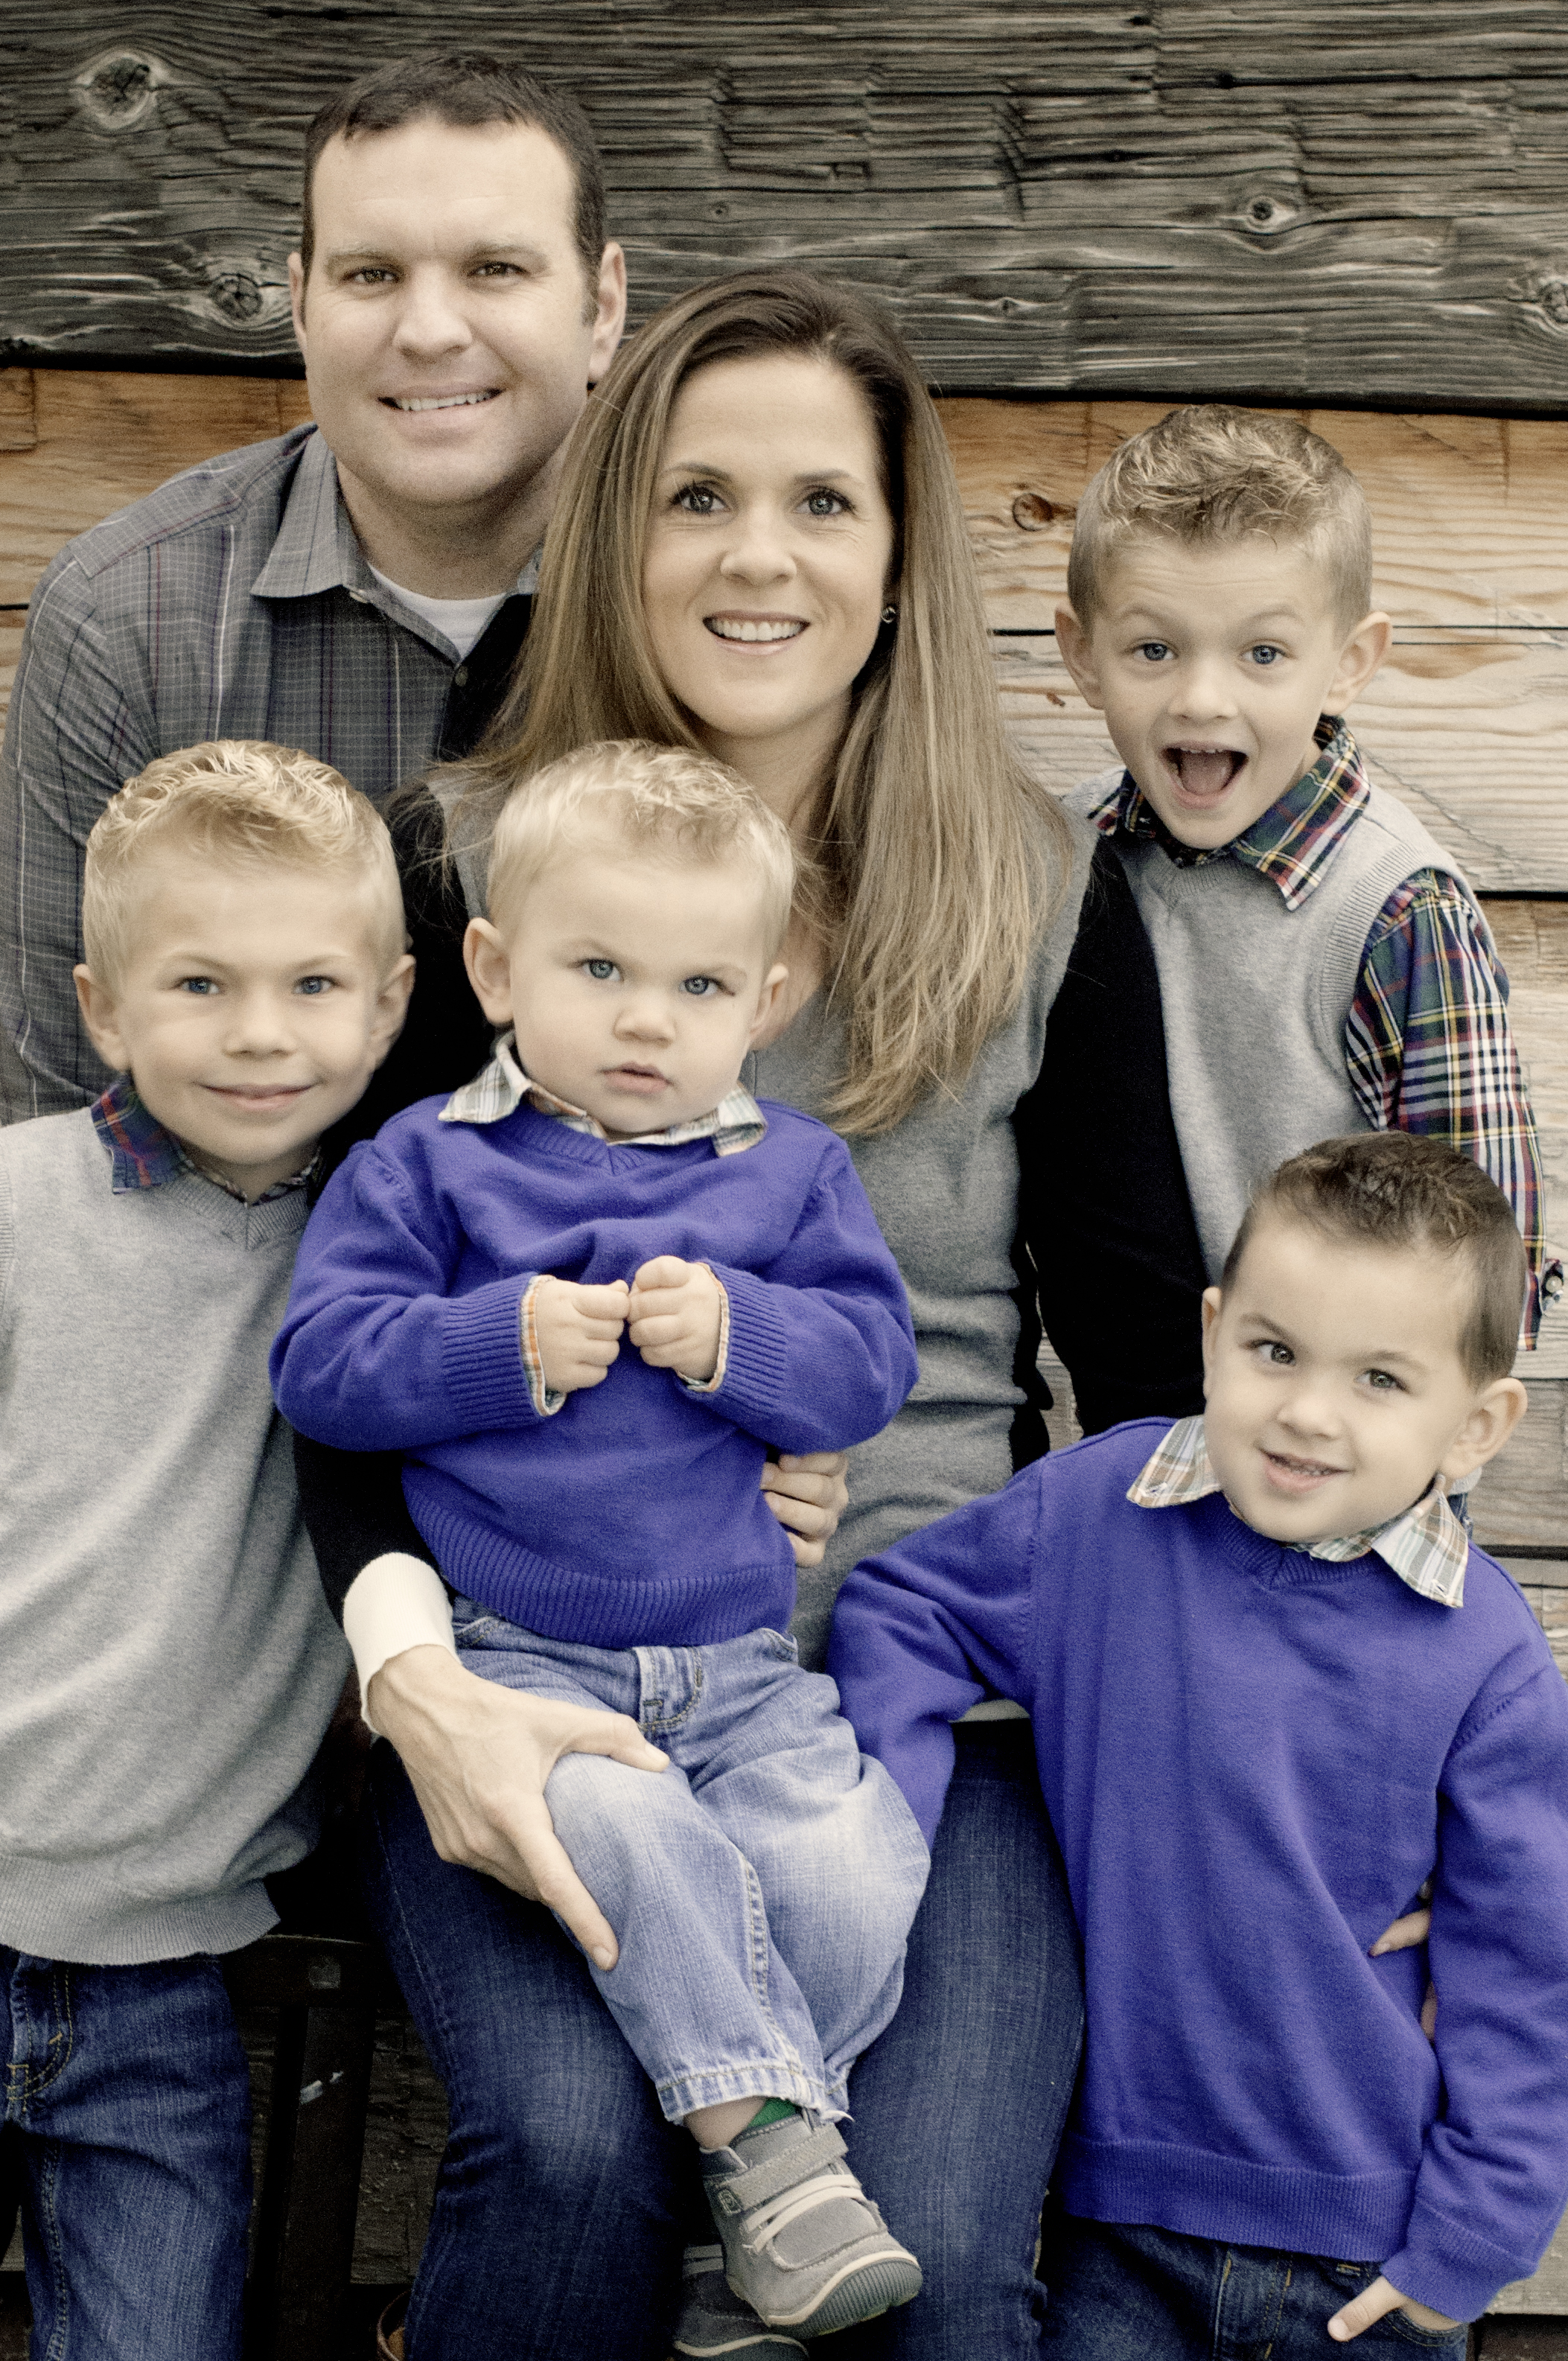 Anderson Family-Family Jailhouse2 crop.jpg